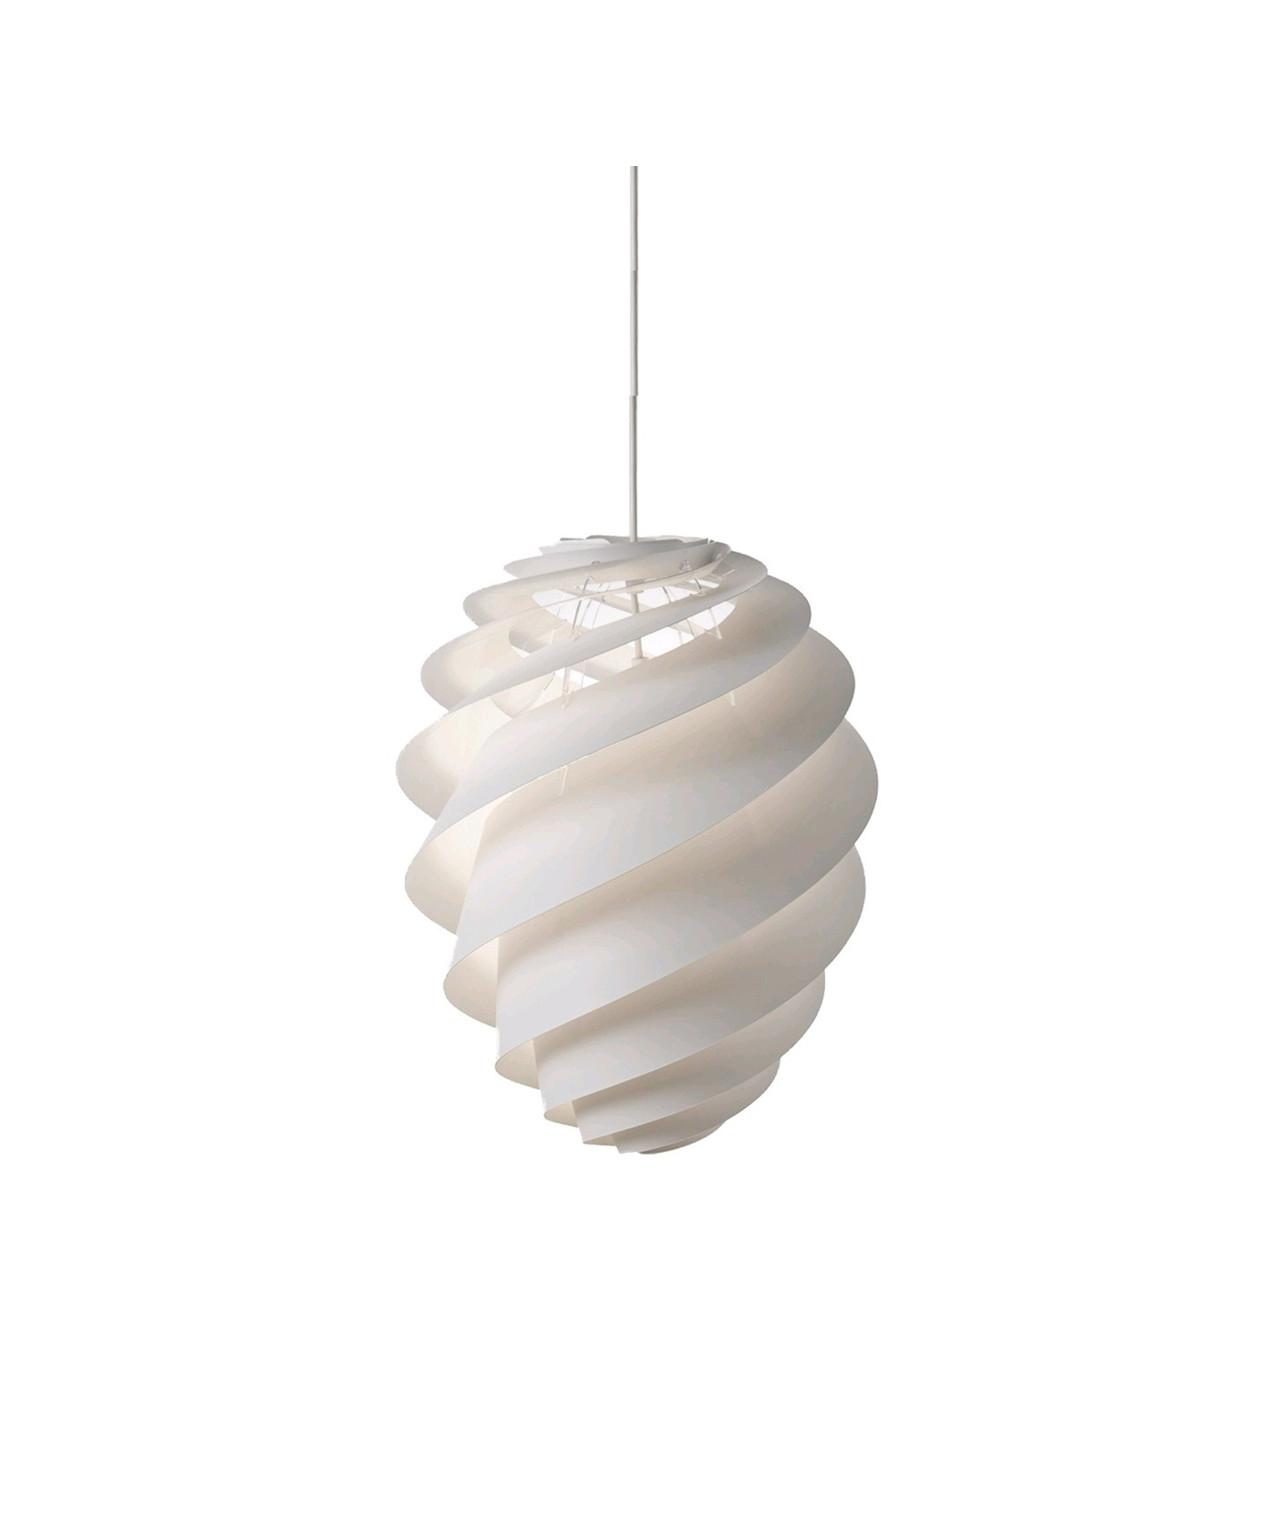 Image of   Swirl 2 Pendel Small Hvid - Le Klint